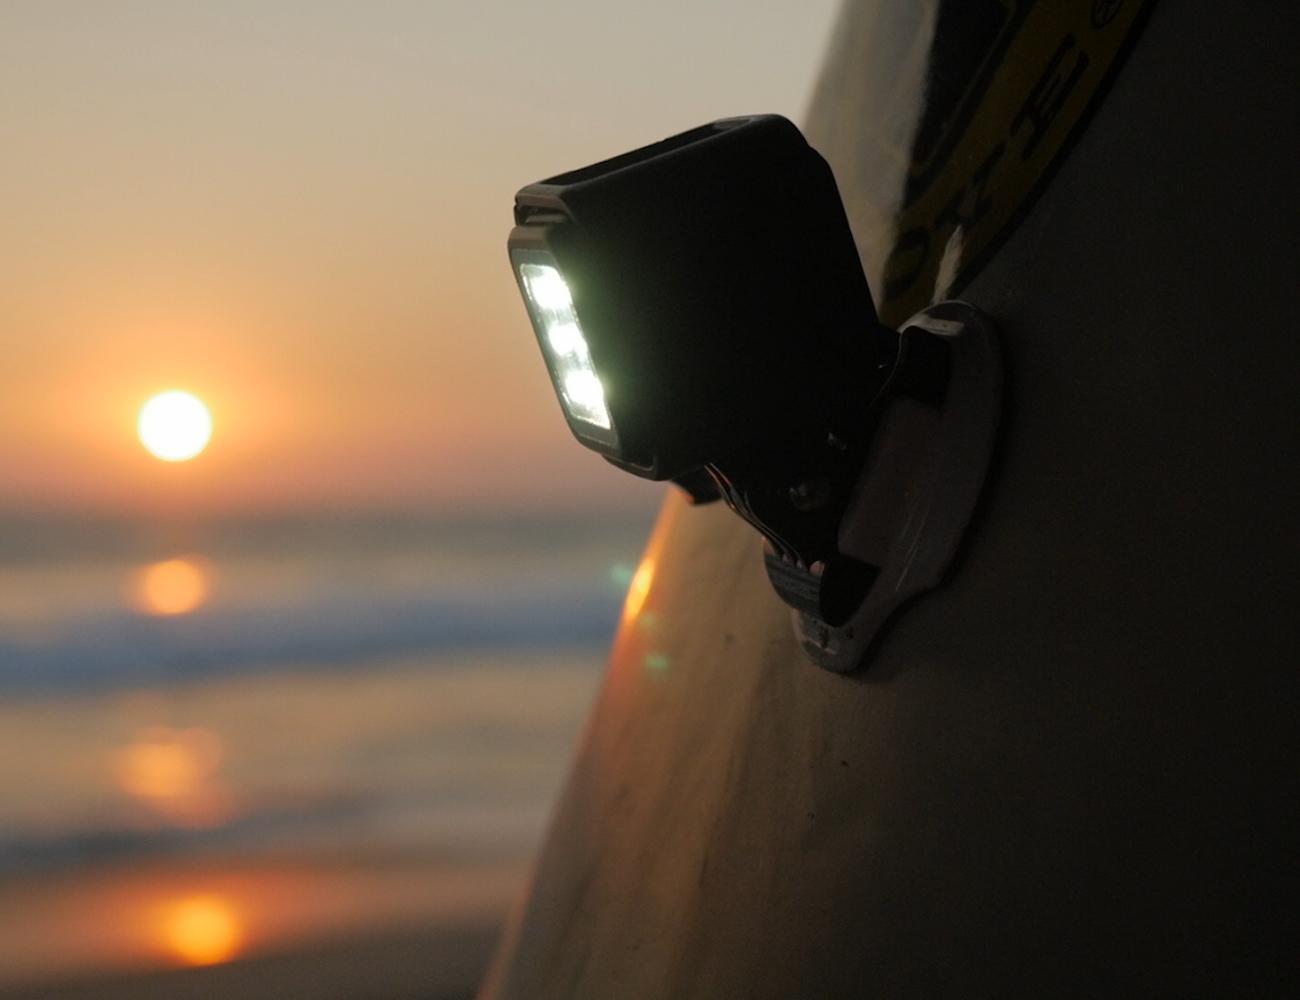 LitraTorch Premium Compact Lighting